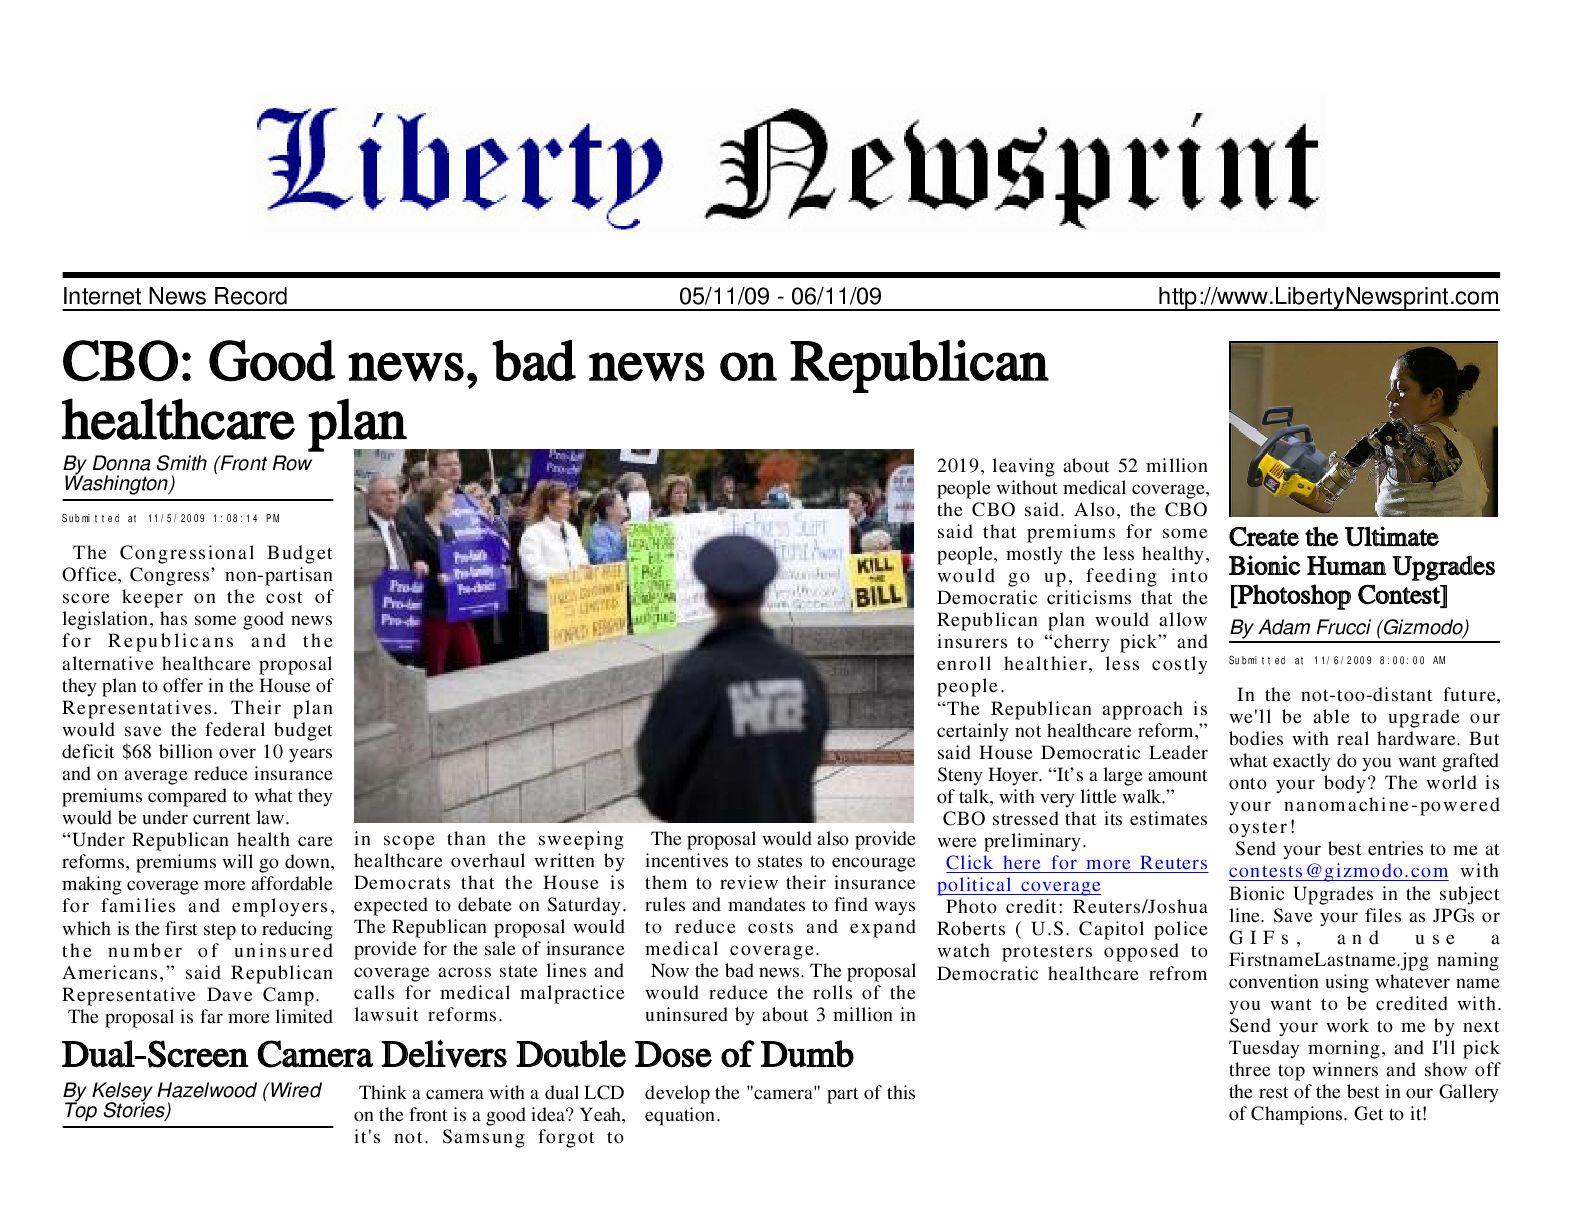 Anss Lee Porno libery newsprint nov-6-09 editionliberty newspost - issuu